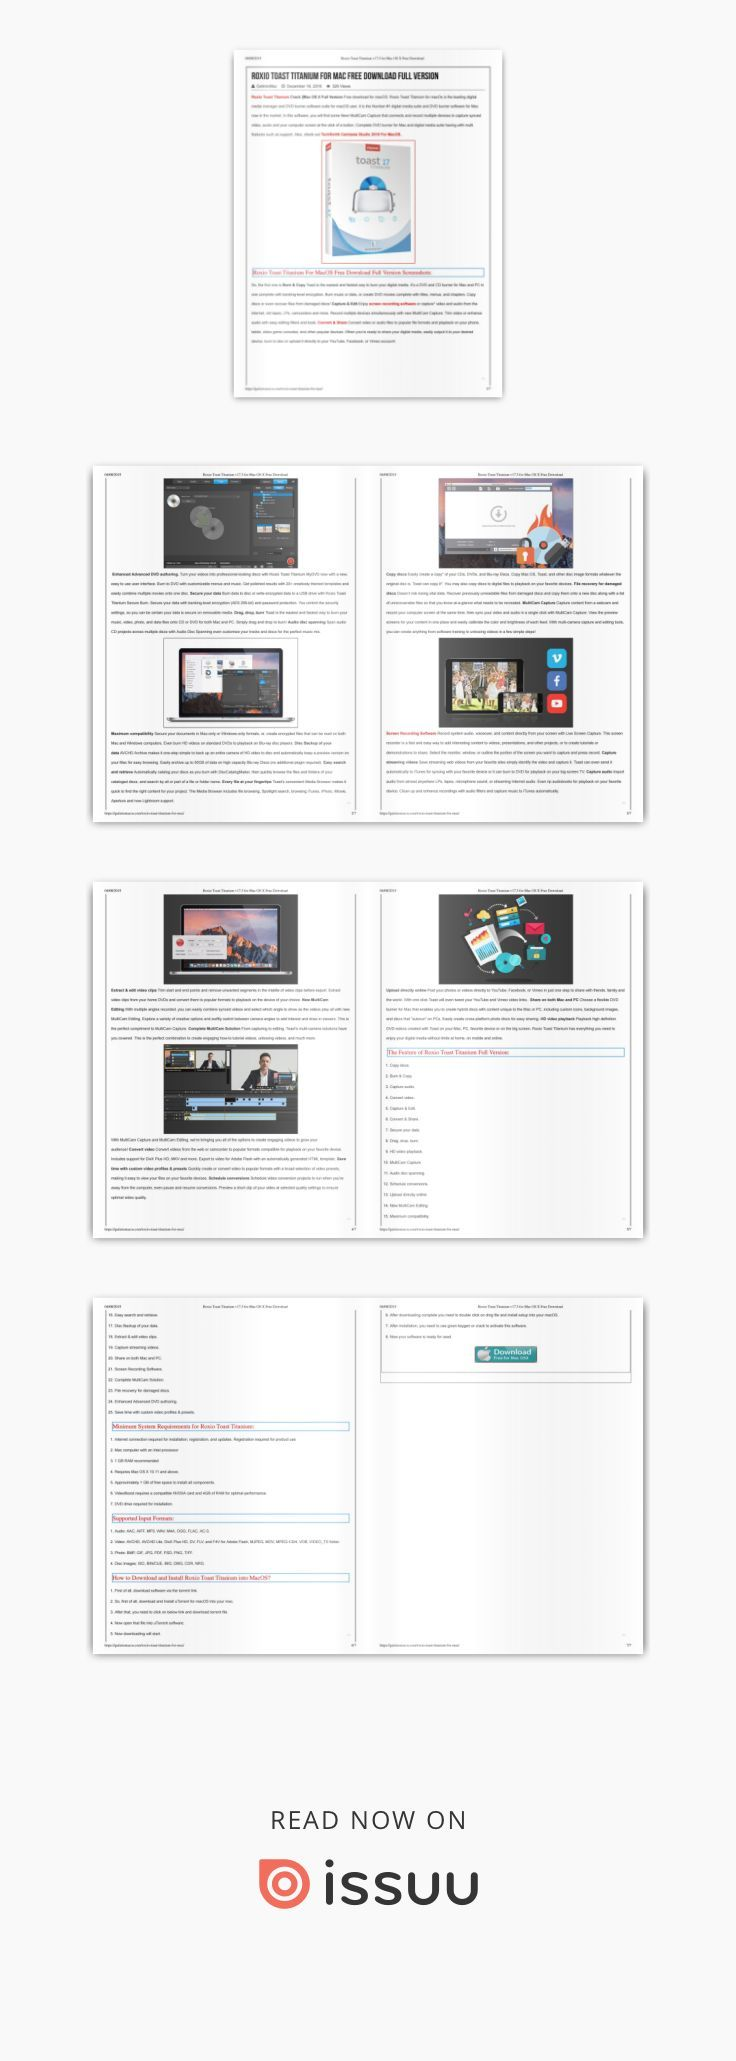 Roxio creator free download windows 10